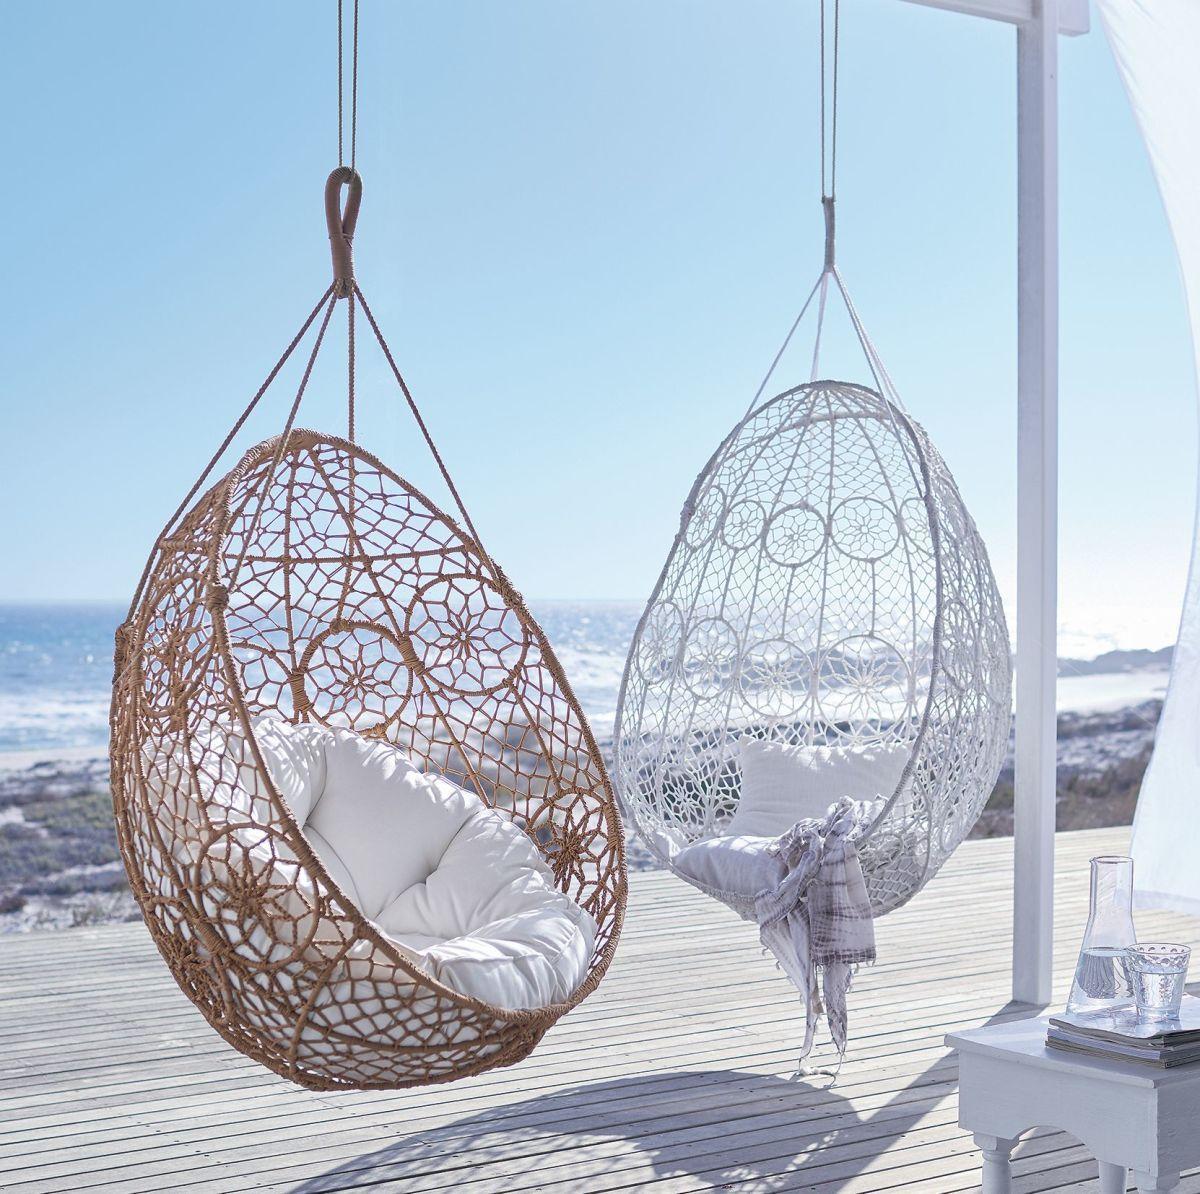 Hanging Wicker Egg Chair Canada Rocking Arm Cushions Boho Hängesessel Outdoorgeeignet Metall